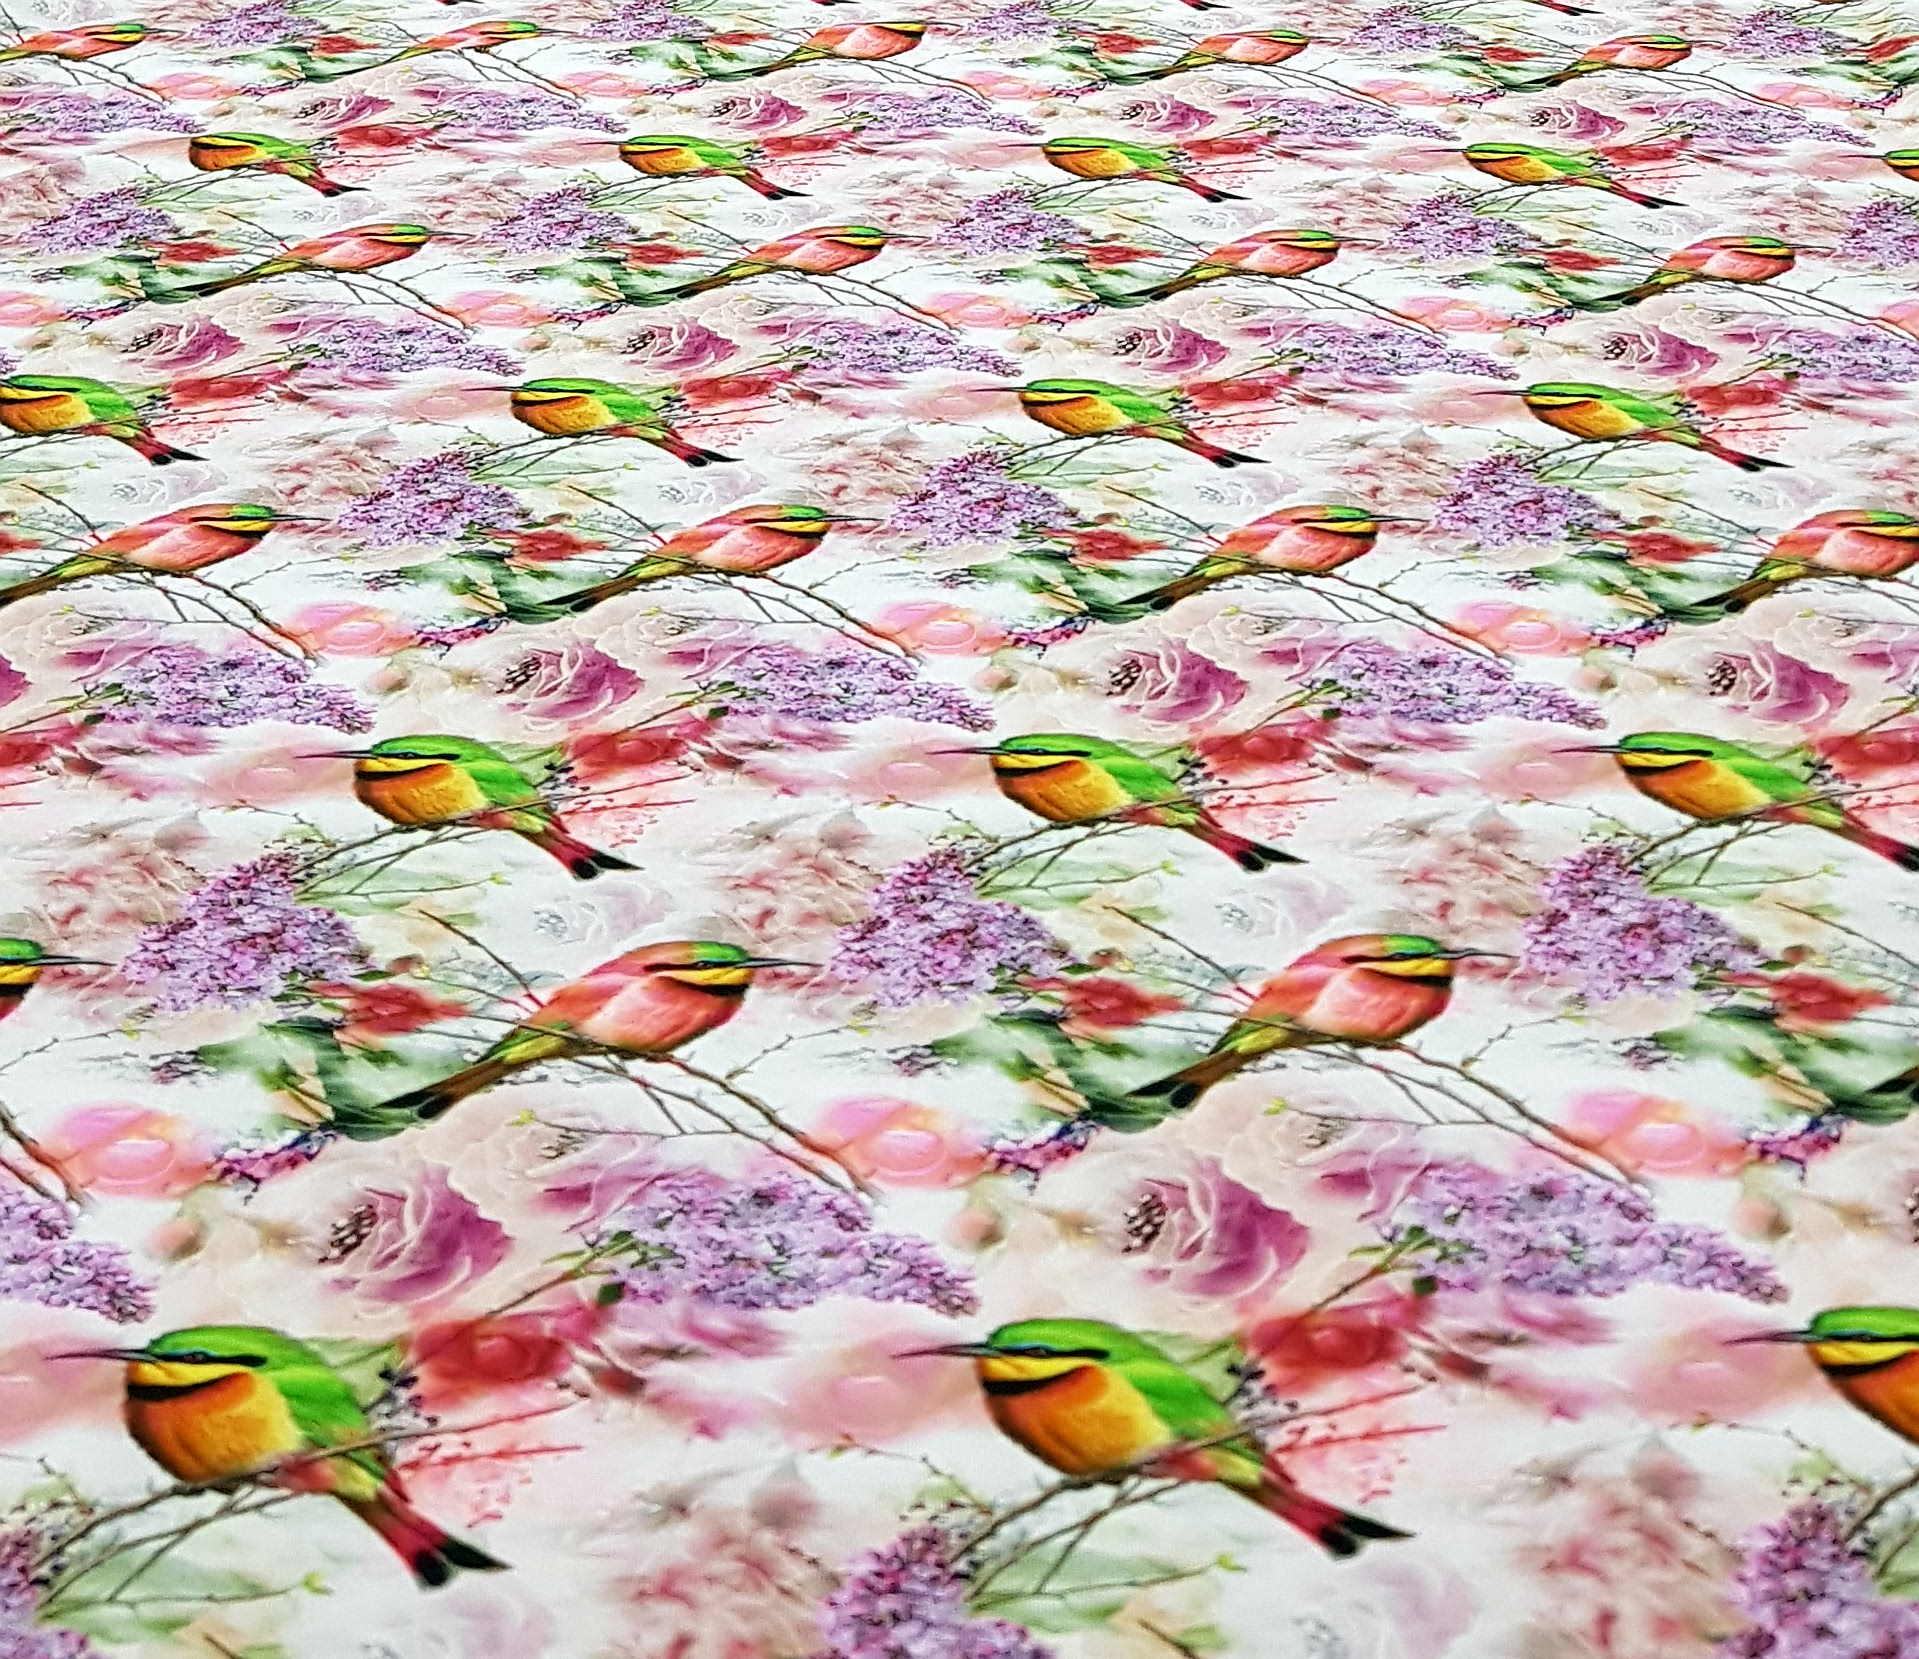 digitaletricotgekleurdevogelswitpaars